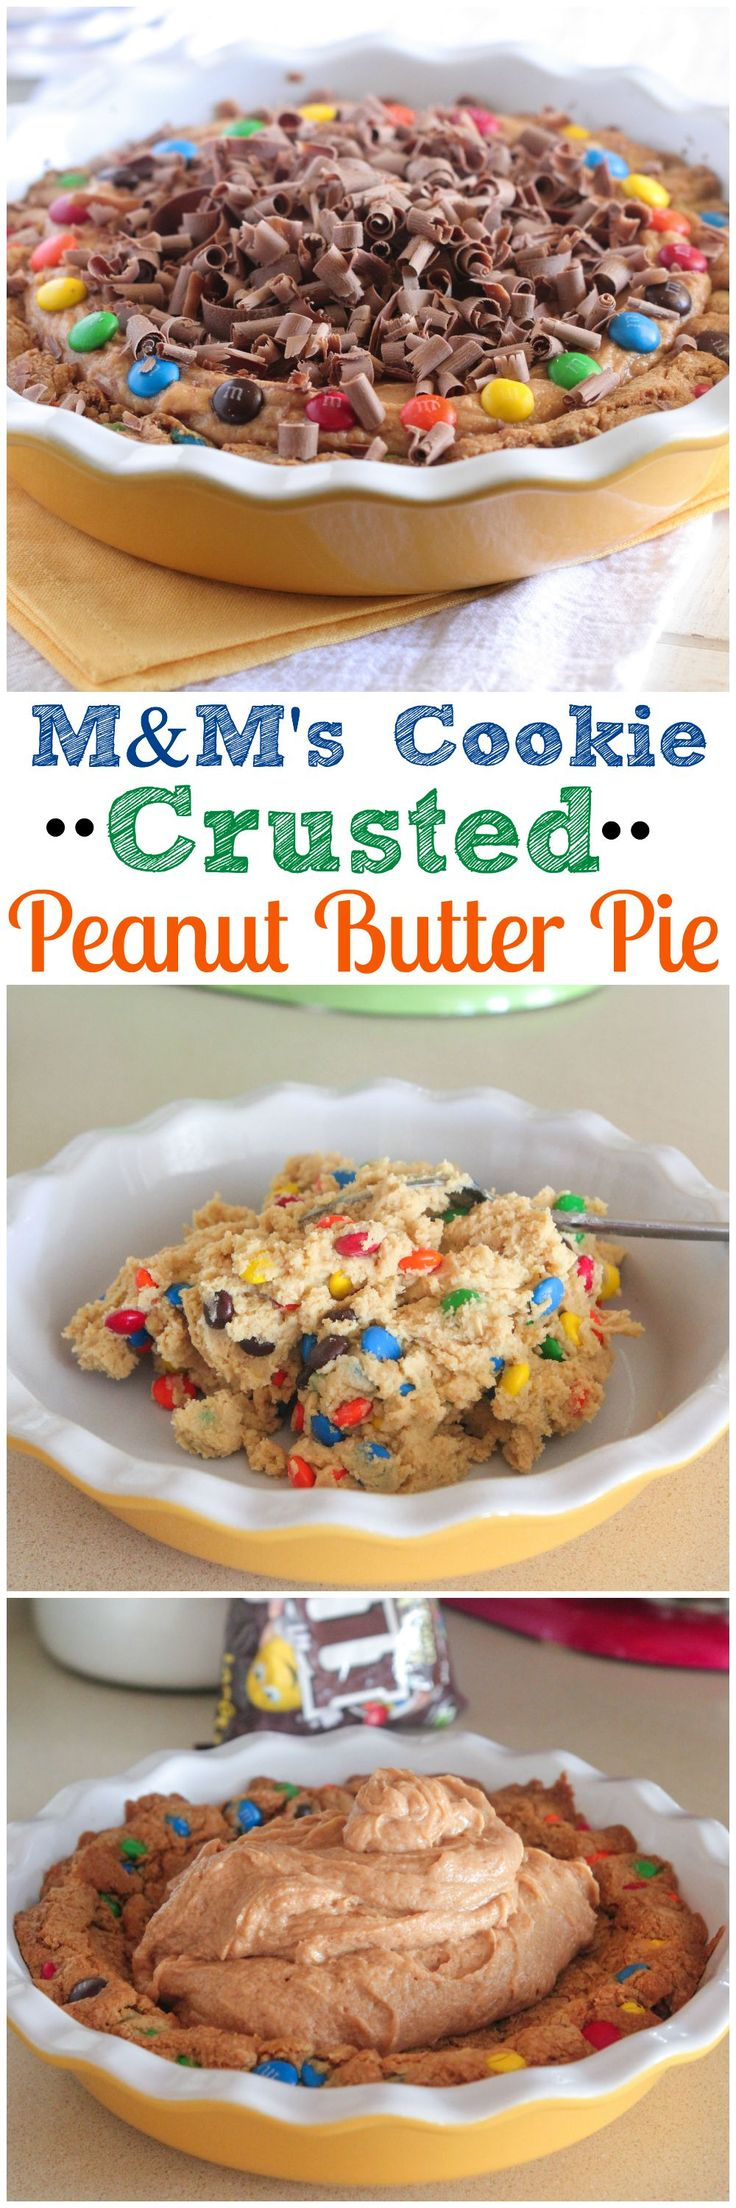 M&M's Cookie Crusted Peanut Butter Pie #pie #dessert #mms #chocolate #recipe #BetterWithMMS